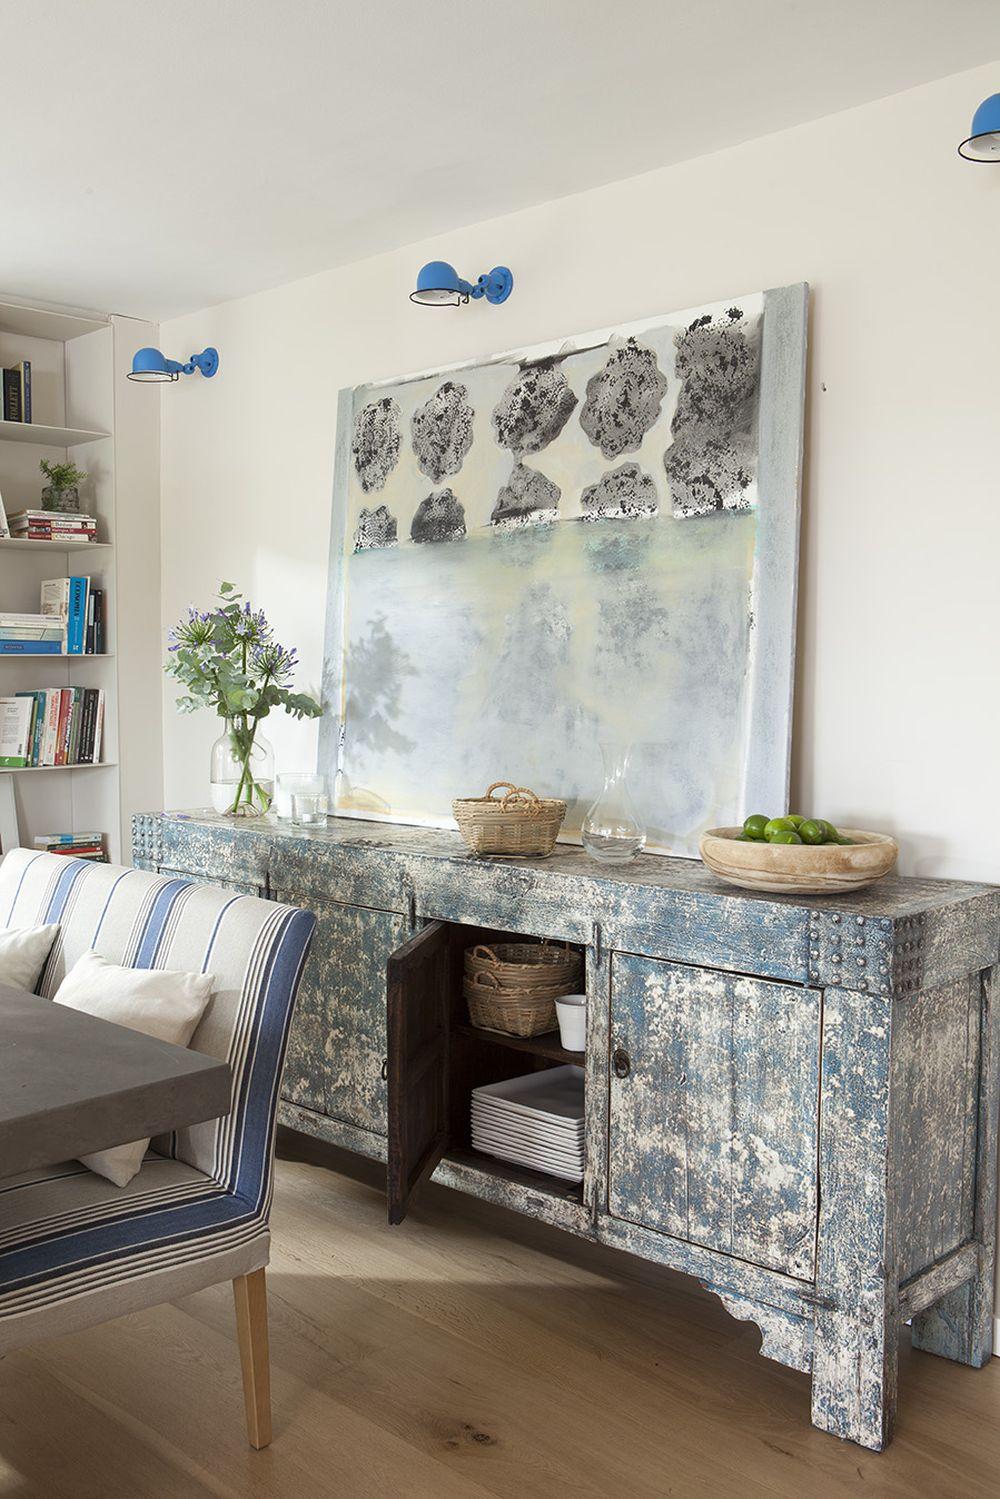 adelaparvu.com despre casa cu gradina, accente marine, designer Jeanette Dresing, Foto Feran Freixa (8)